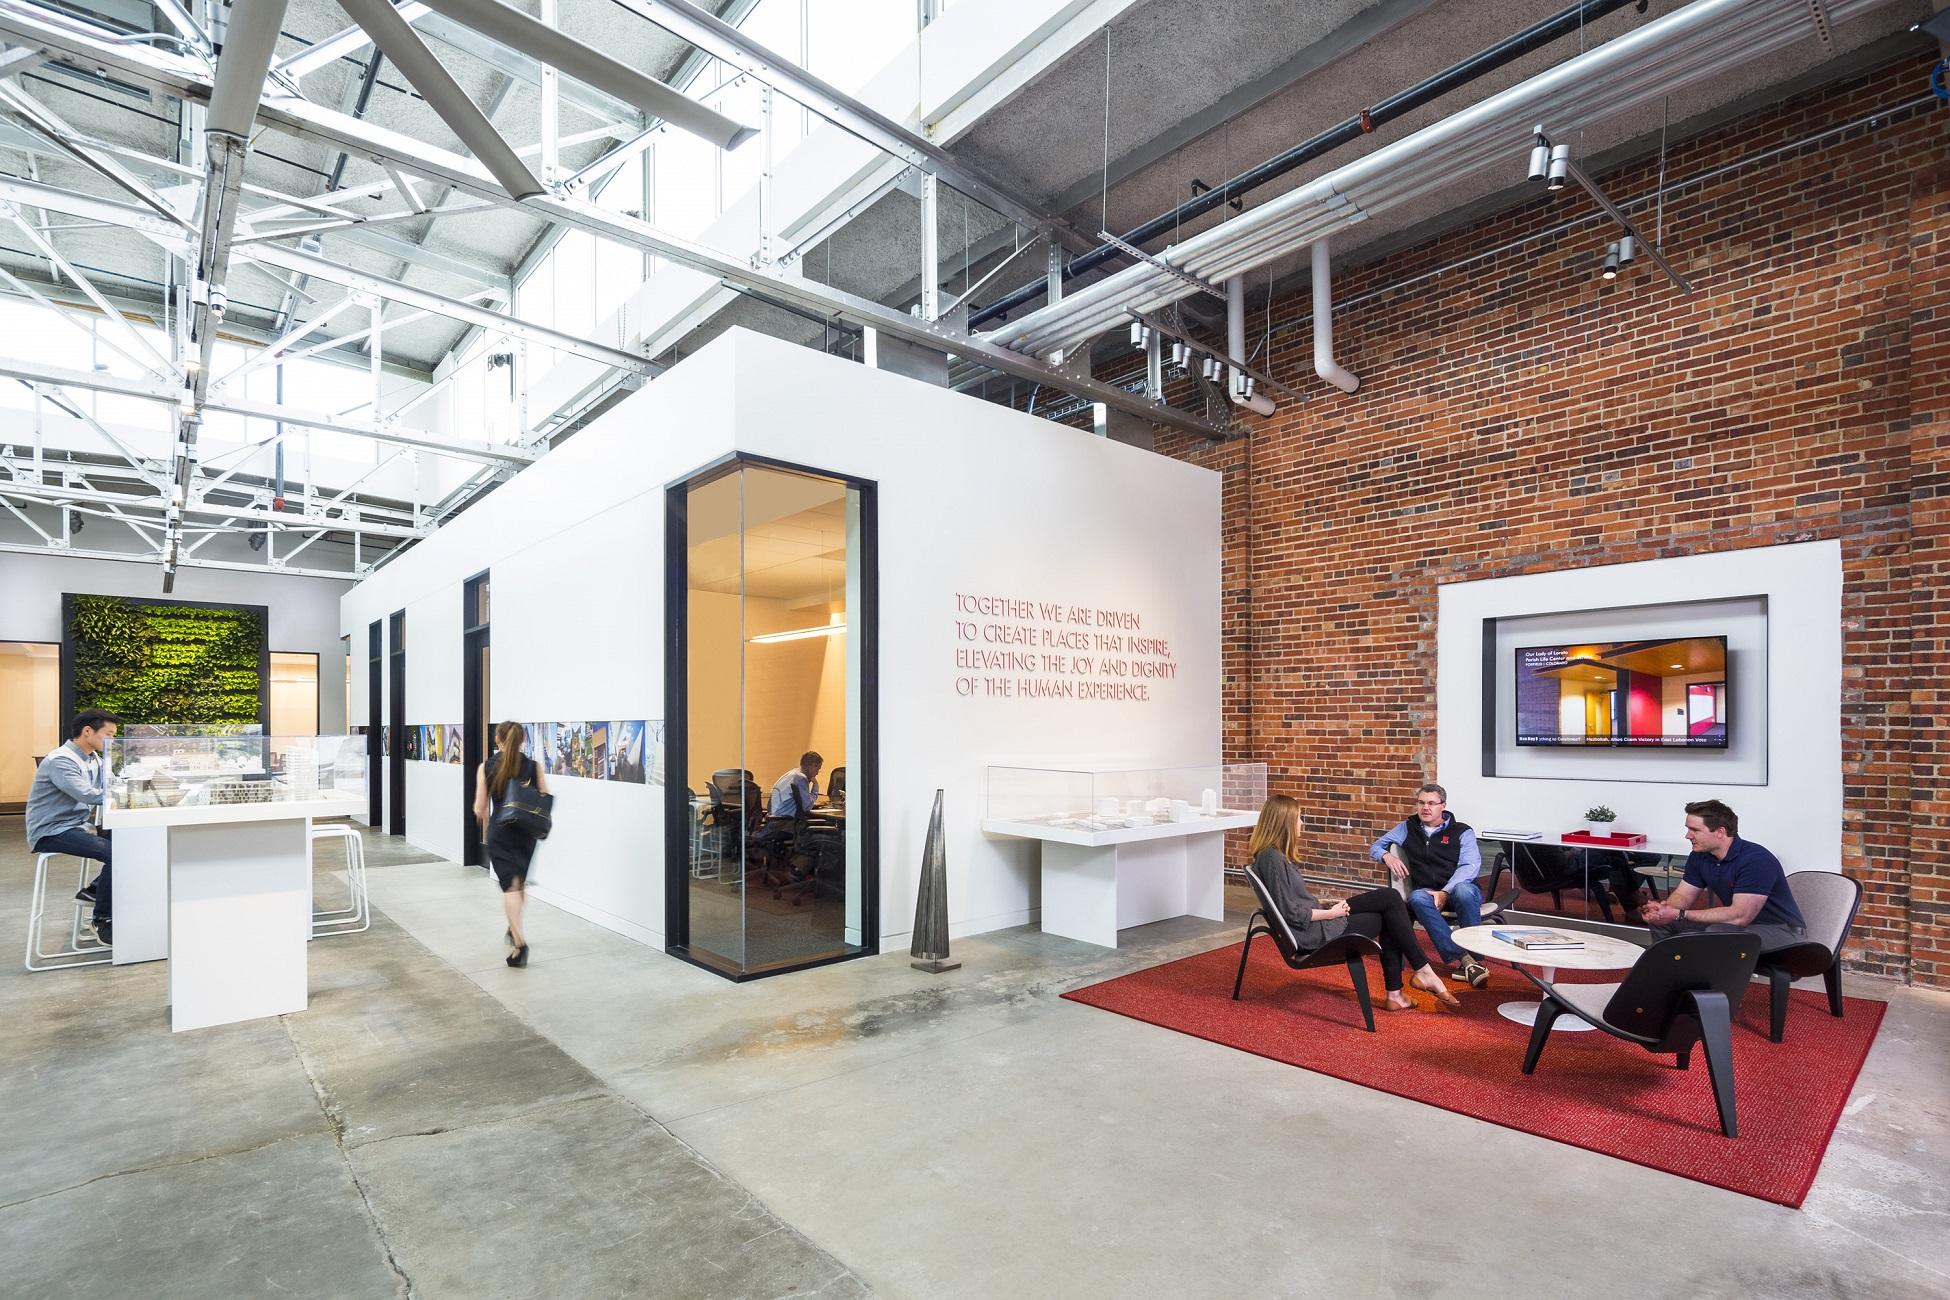 Award of Honor - Bindery on BlakeLisa Bartlett - Davis Partnership Architects